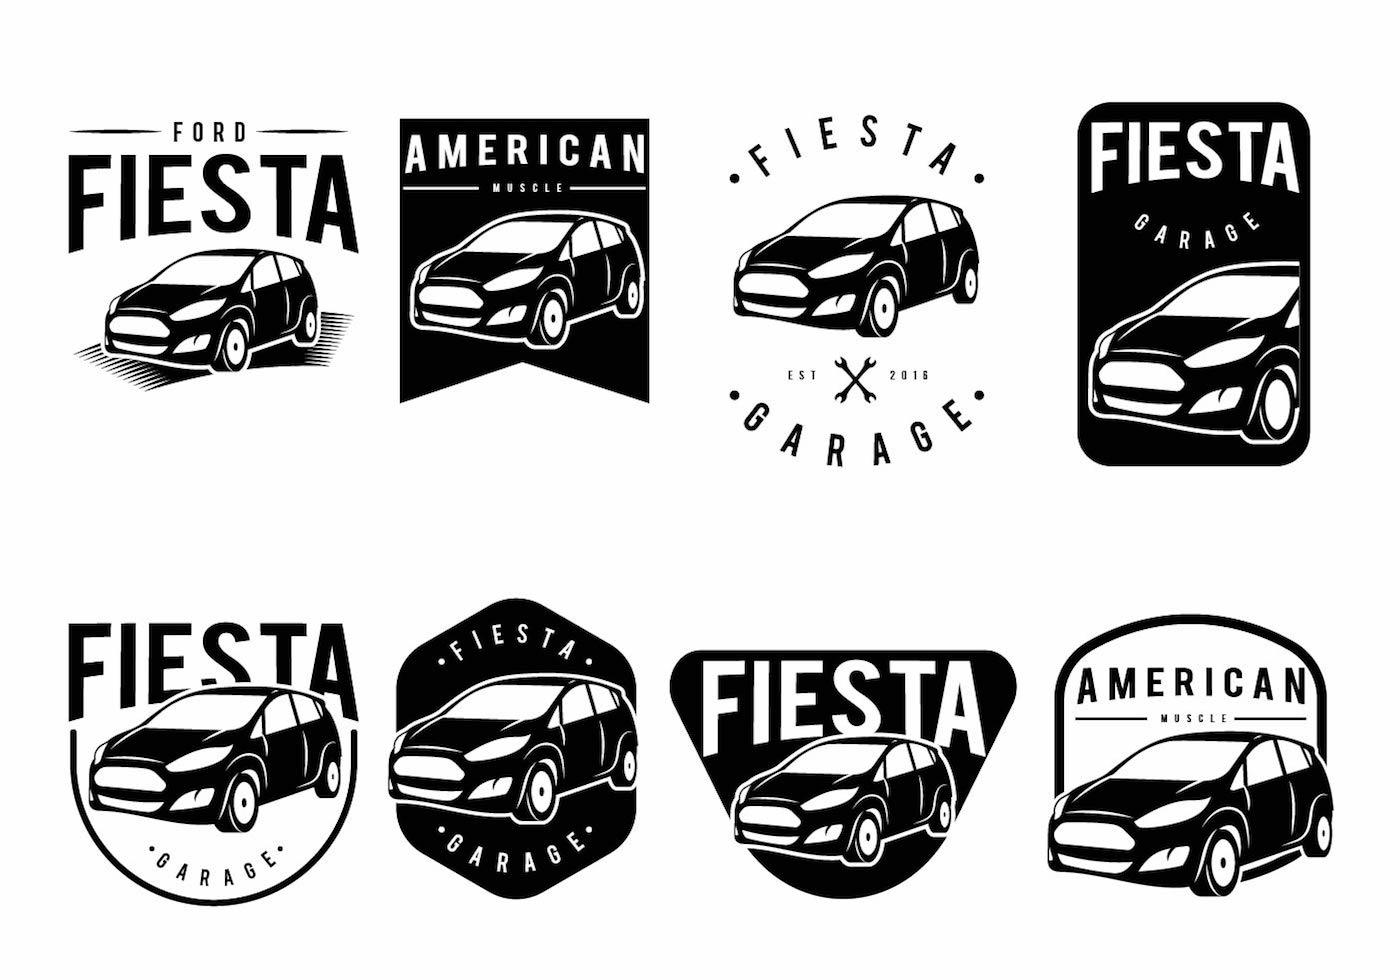 Ford Fiesta Badge Set Download Free Vector Art Stock